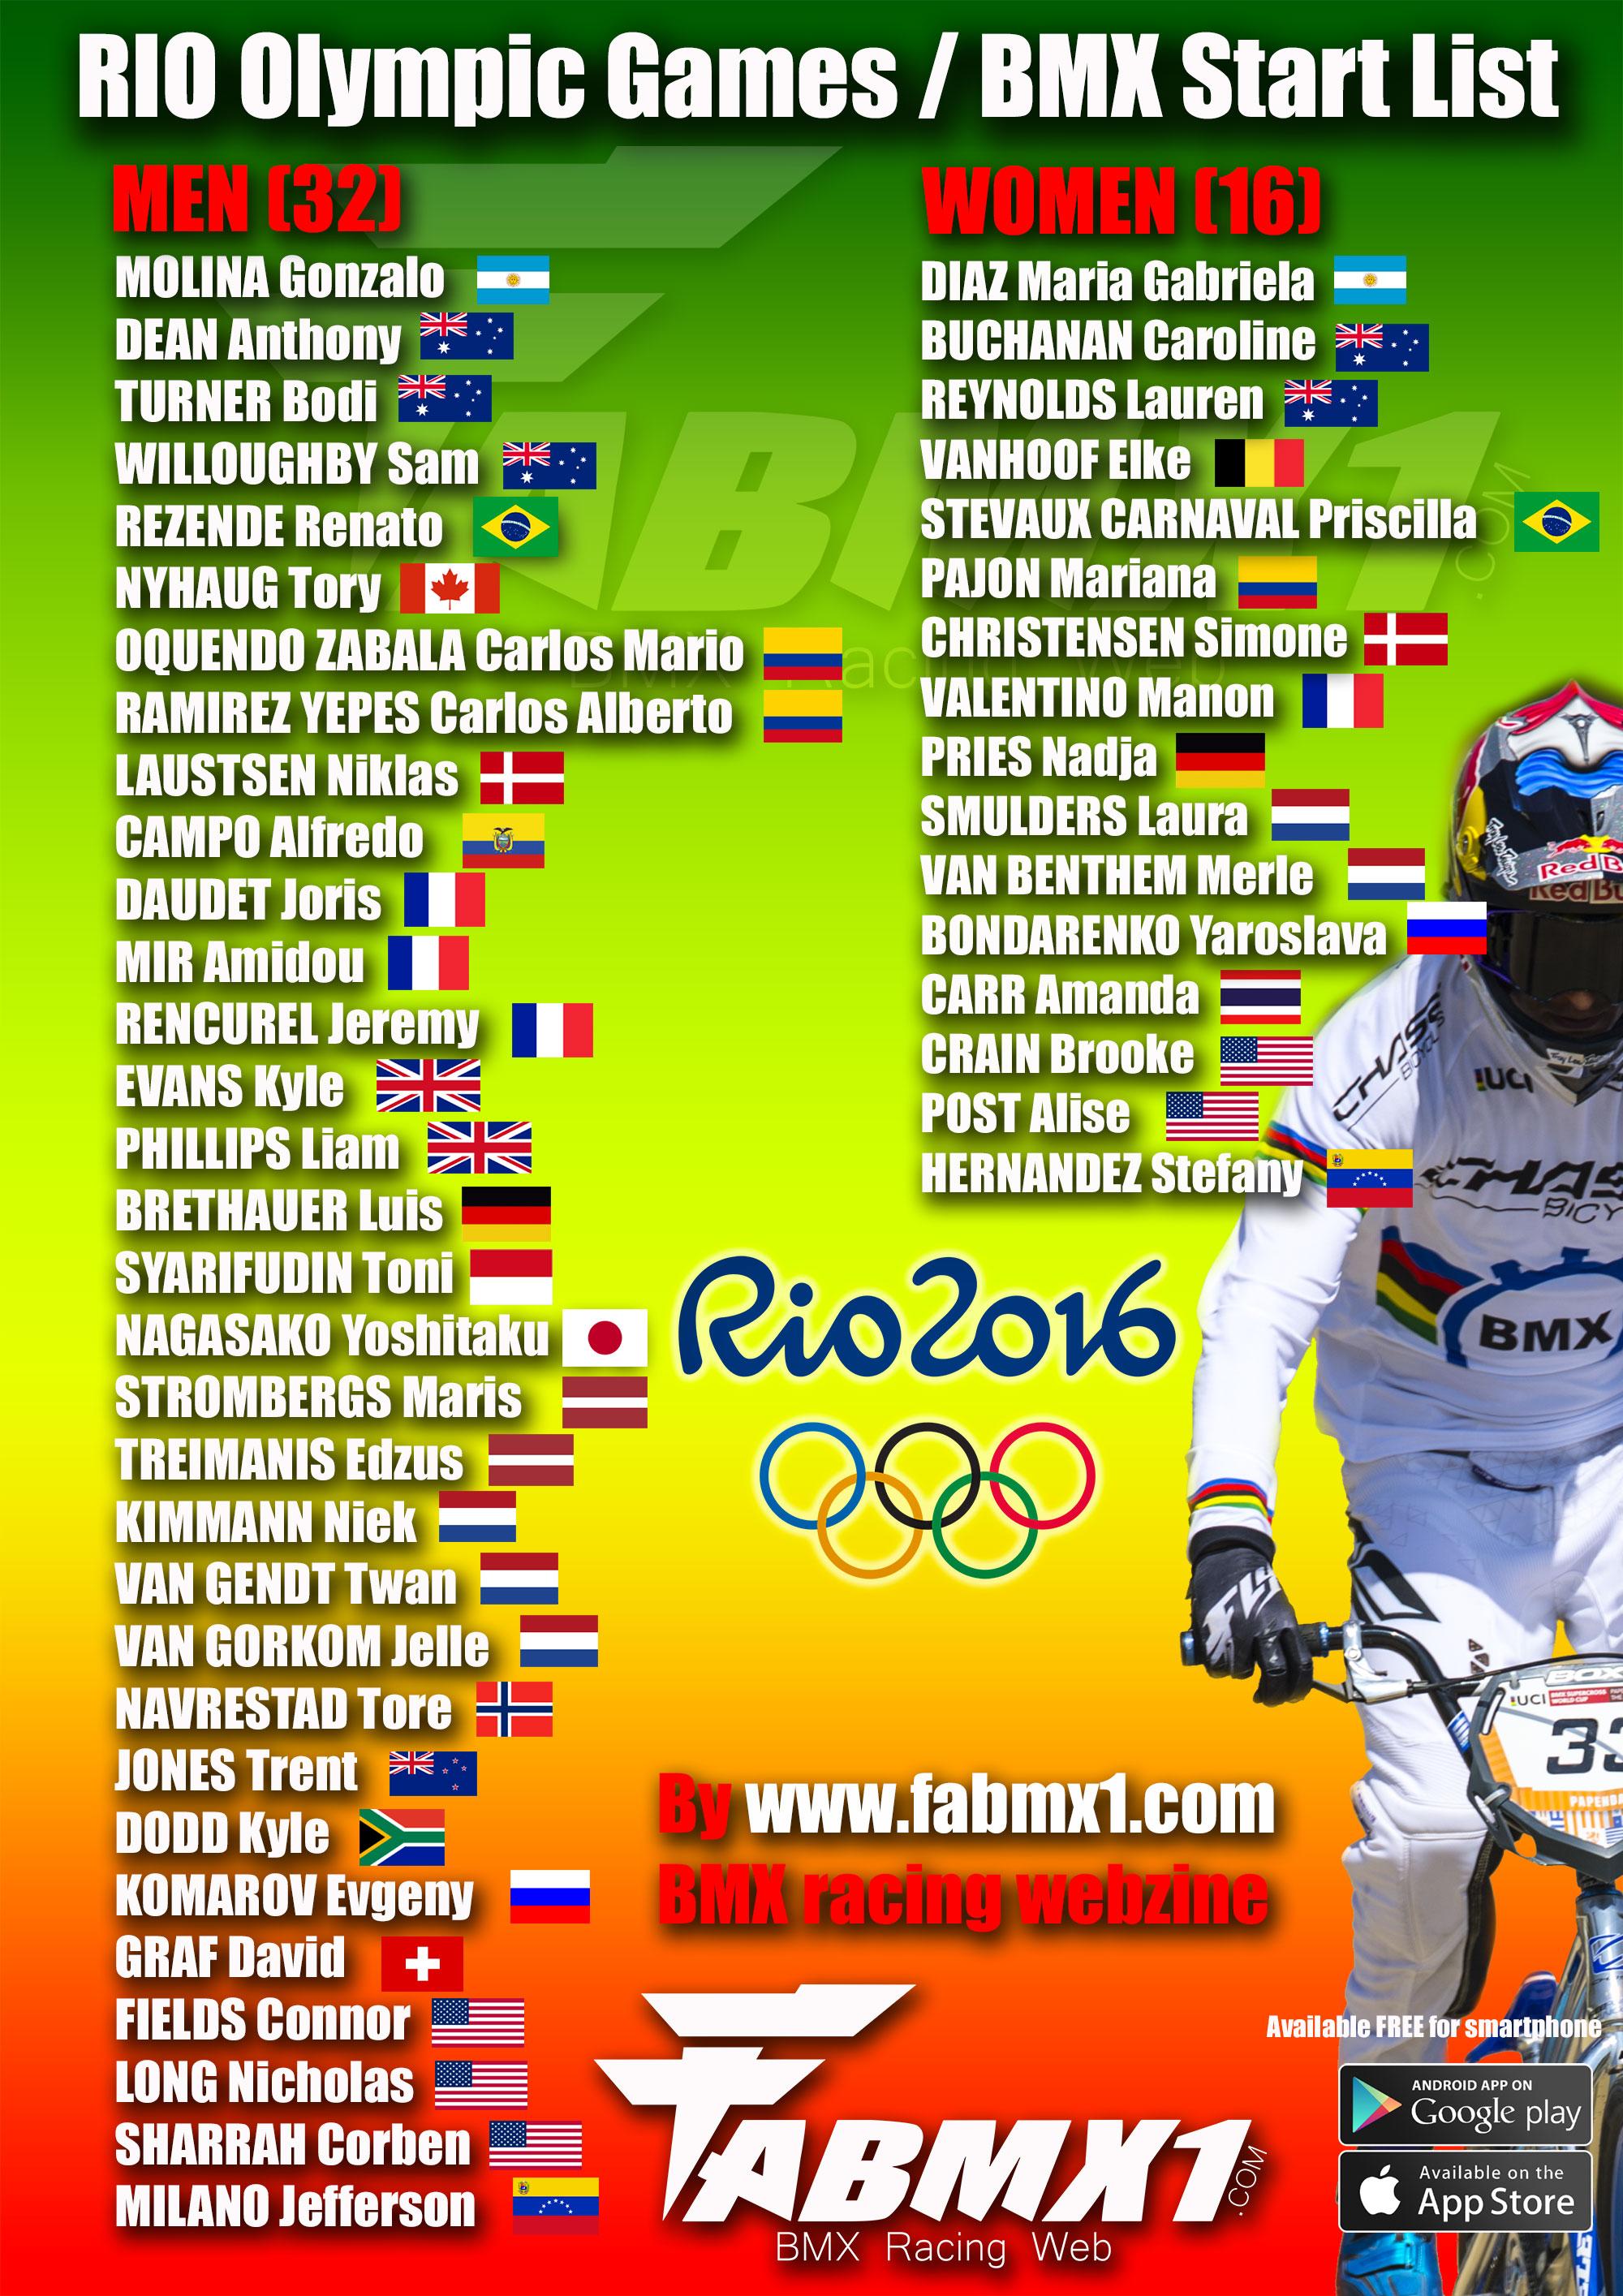 RIO-Olympic-Games-BMX-starting-list-1